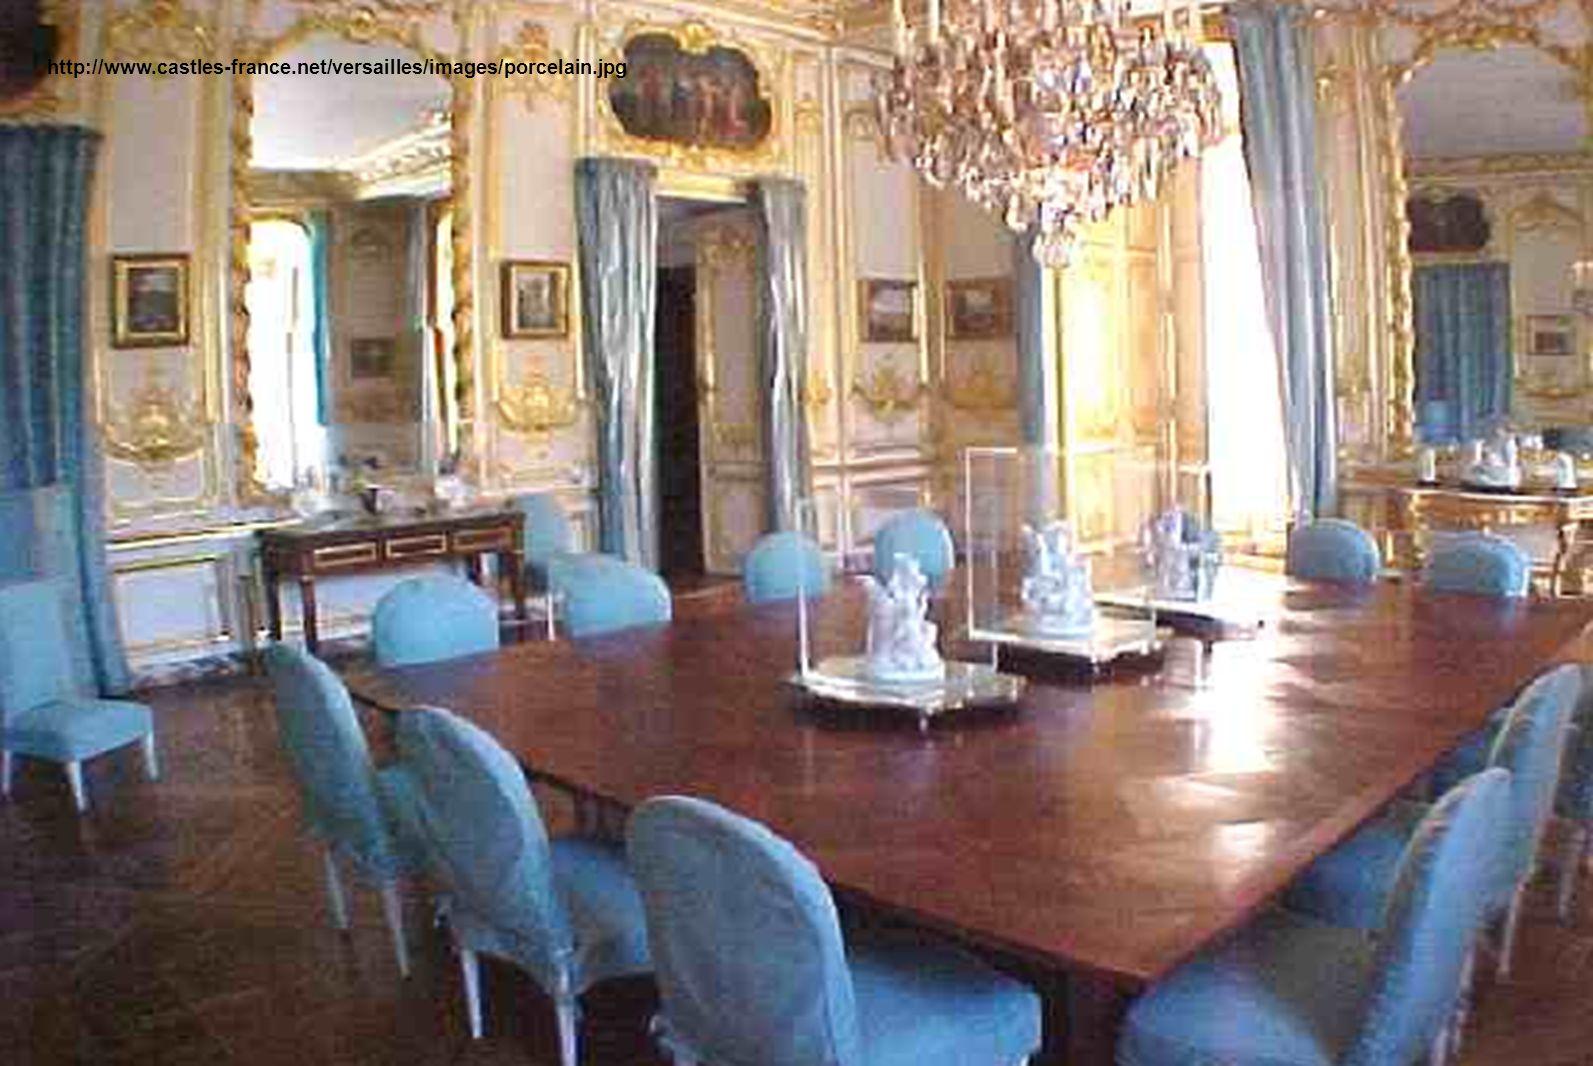 http://www.castles-france.net/versailles/images/porcelain.jpg